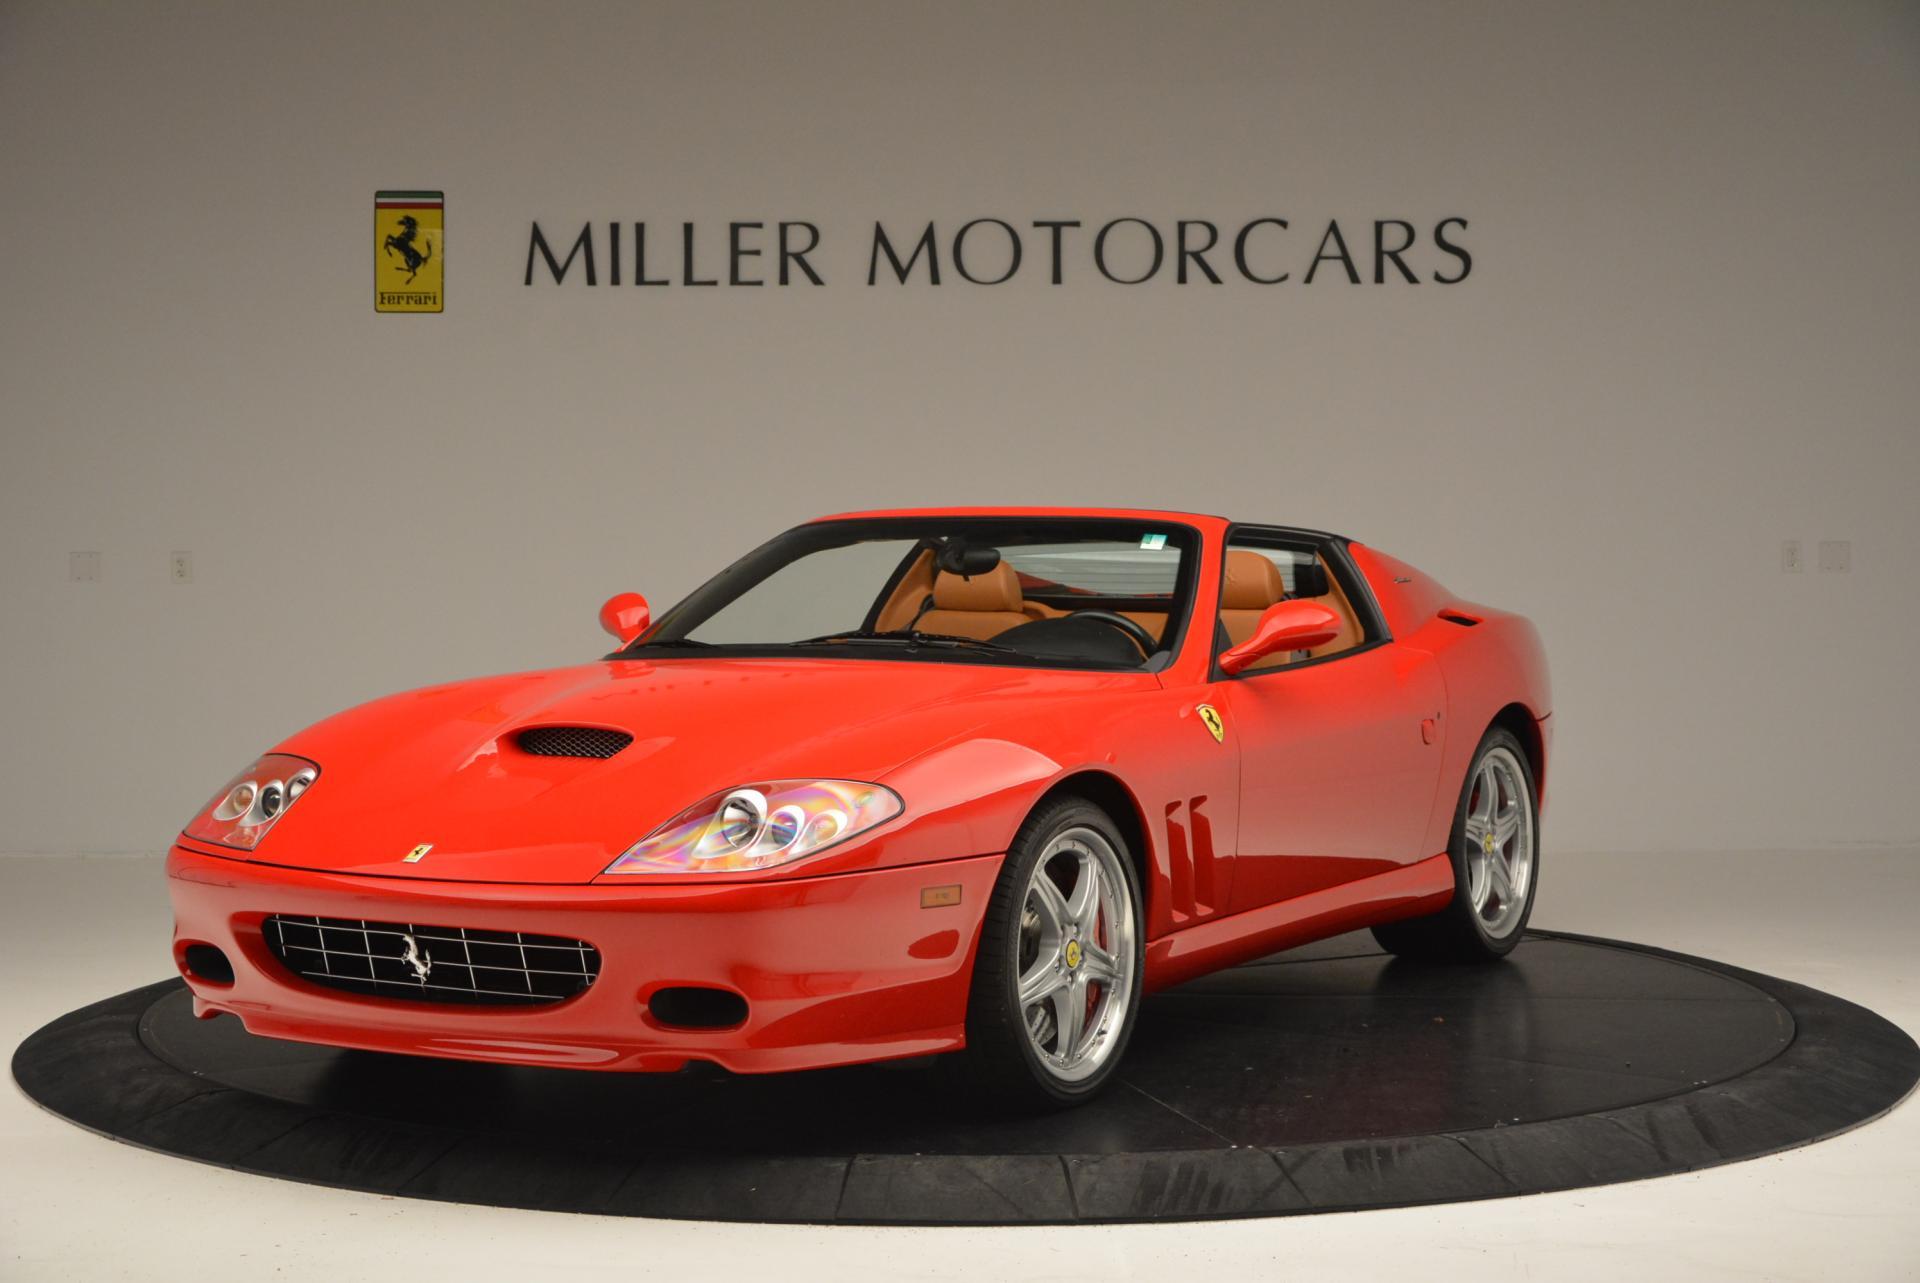 Used 2005 Ferrari Superamerica for sale Sold at Bugatti of Greenwich in Greenwich CT 06830 1